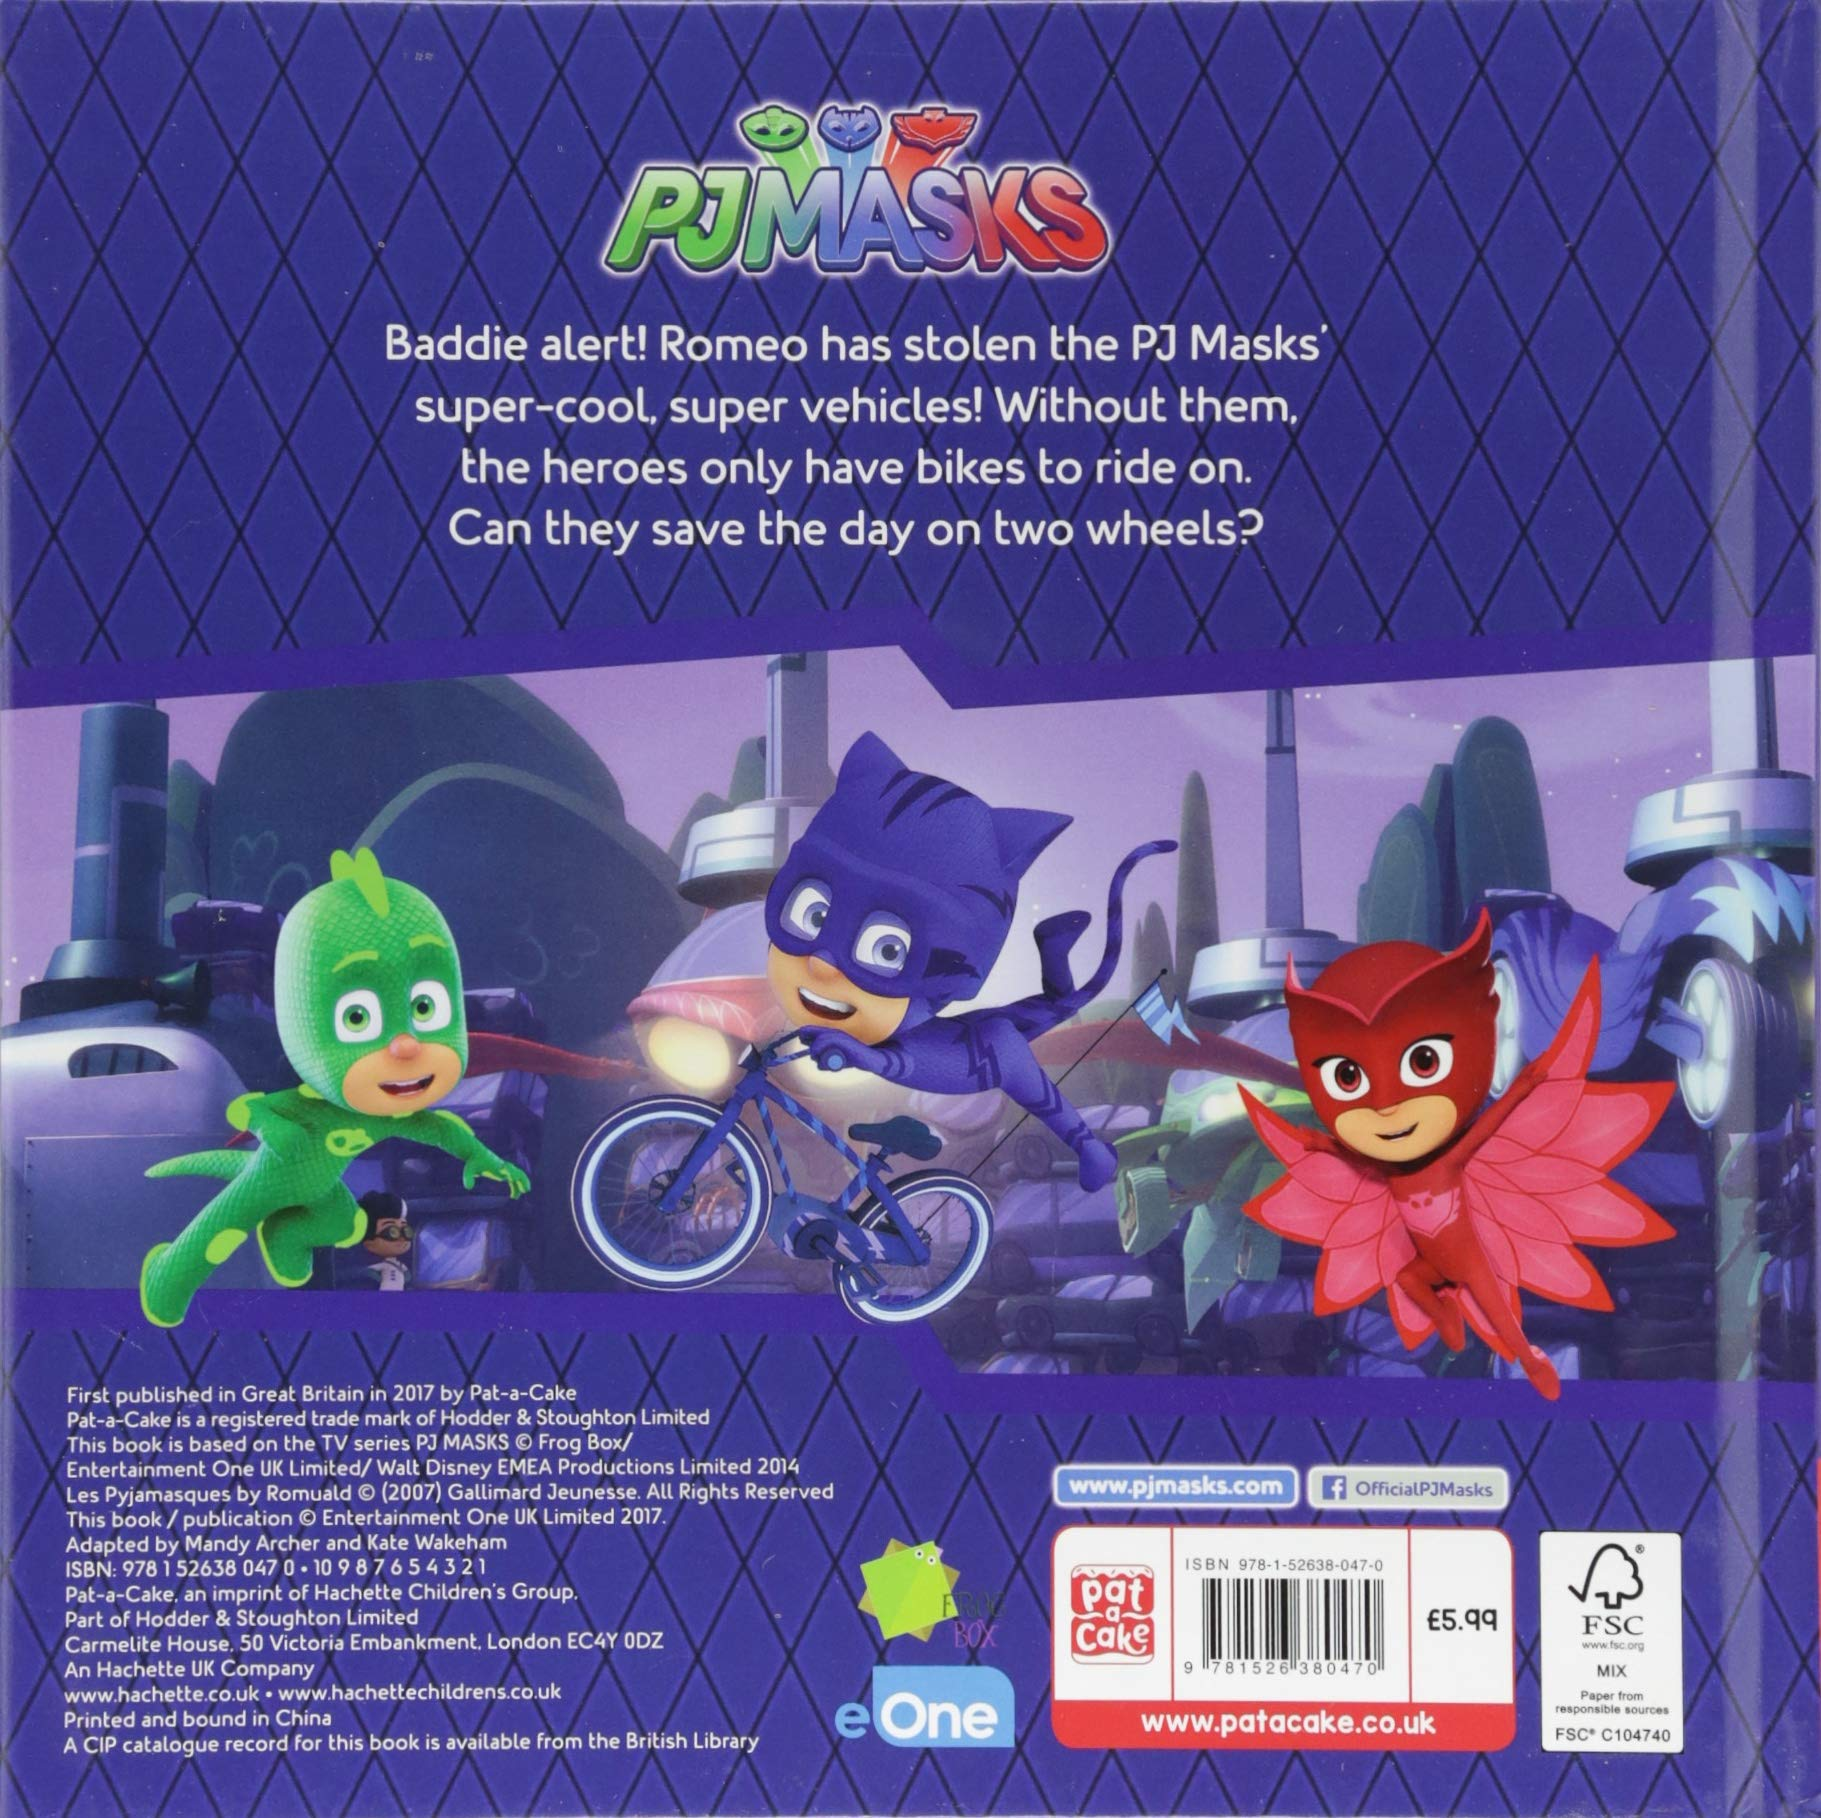 Pedal Power: A PJ Masks story book: Amazon.es: Pat-a-Cake, PJ Masks: Libros en idiomas extranjeros